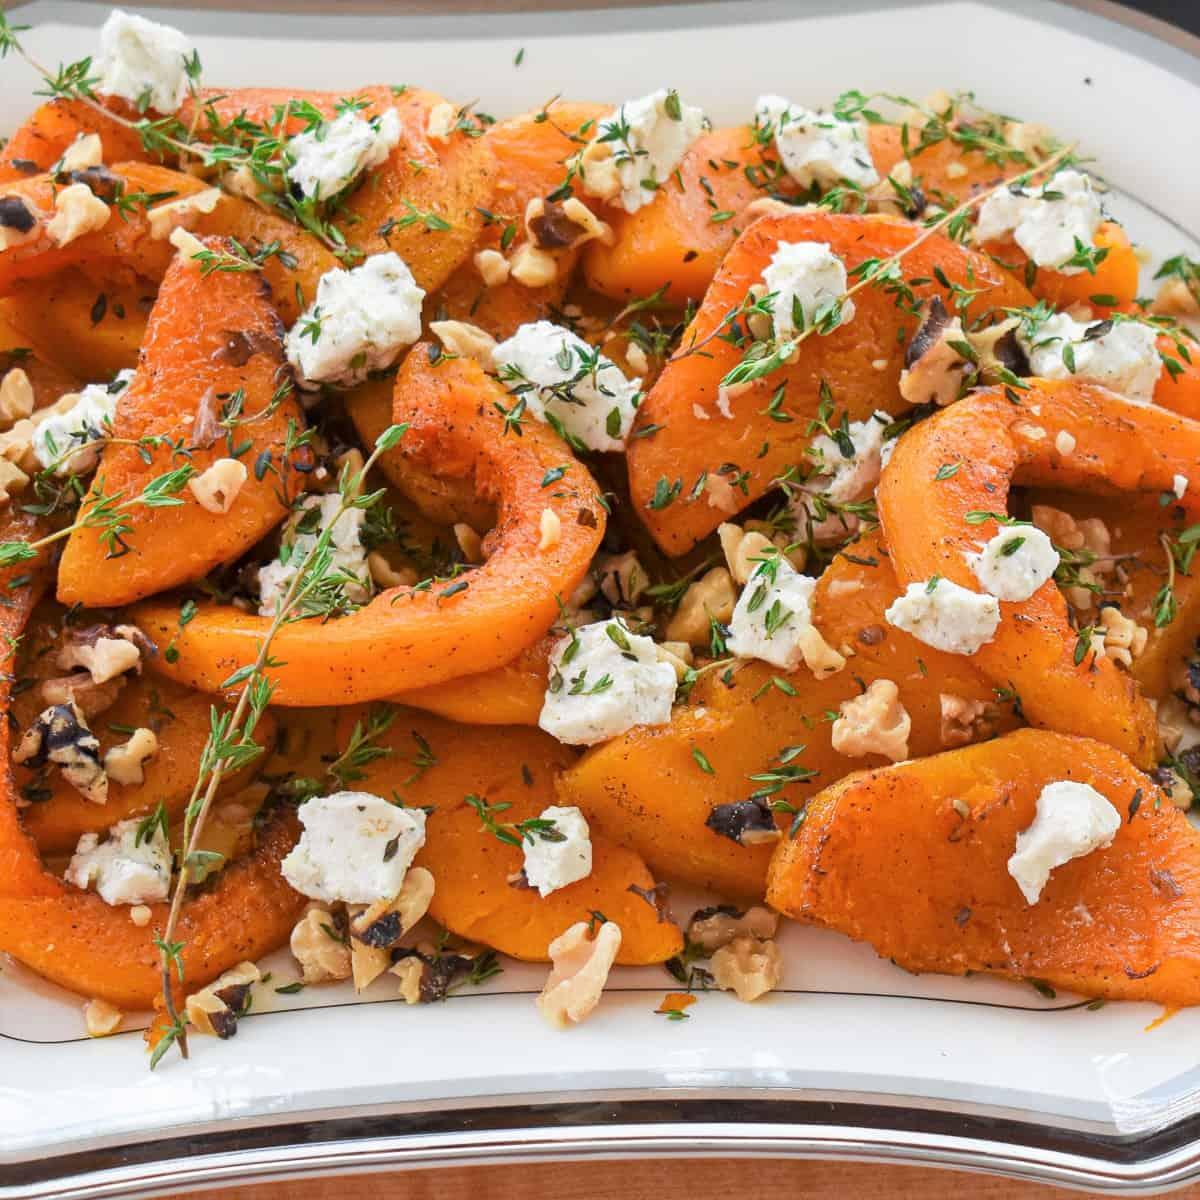 platter of roasted squash